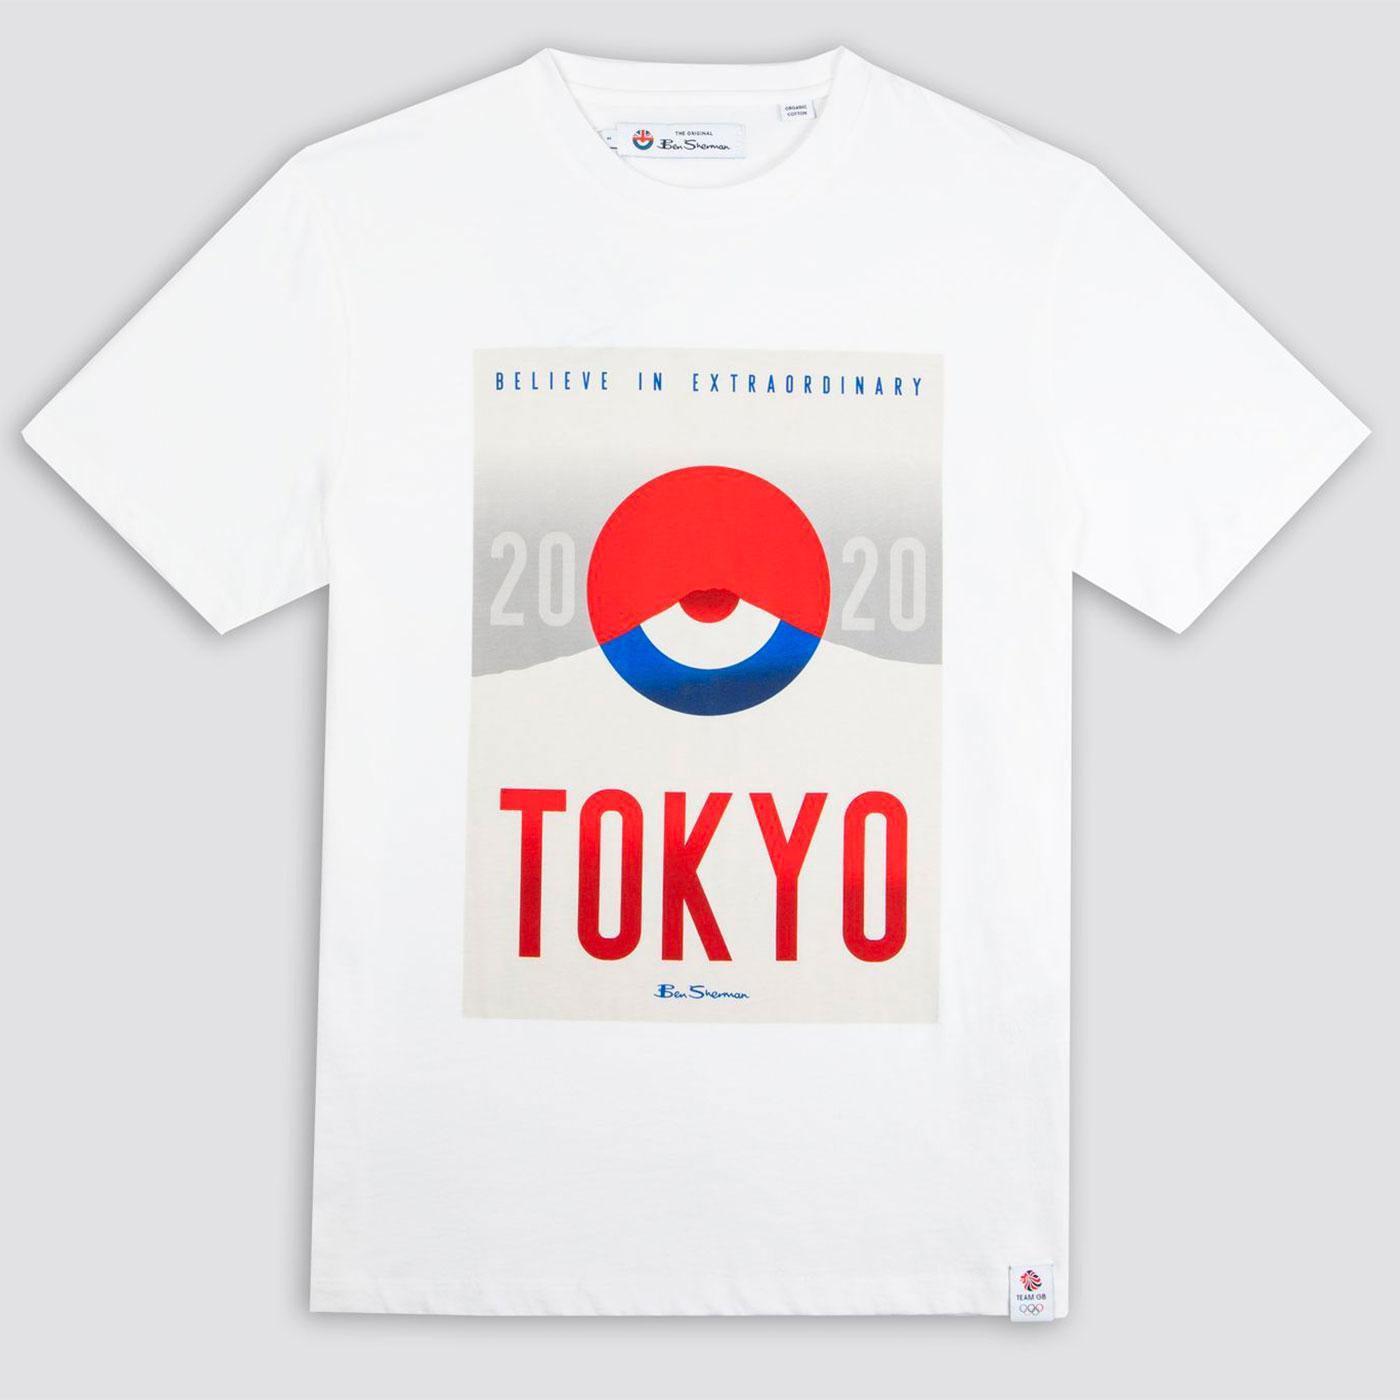 BEN SHERMAN x Team GB Tokyo Art Retro Tee